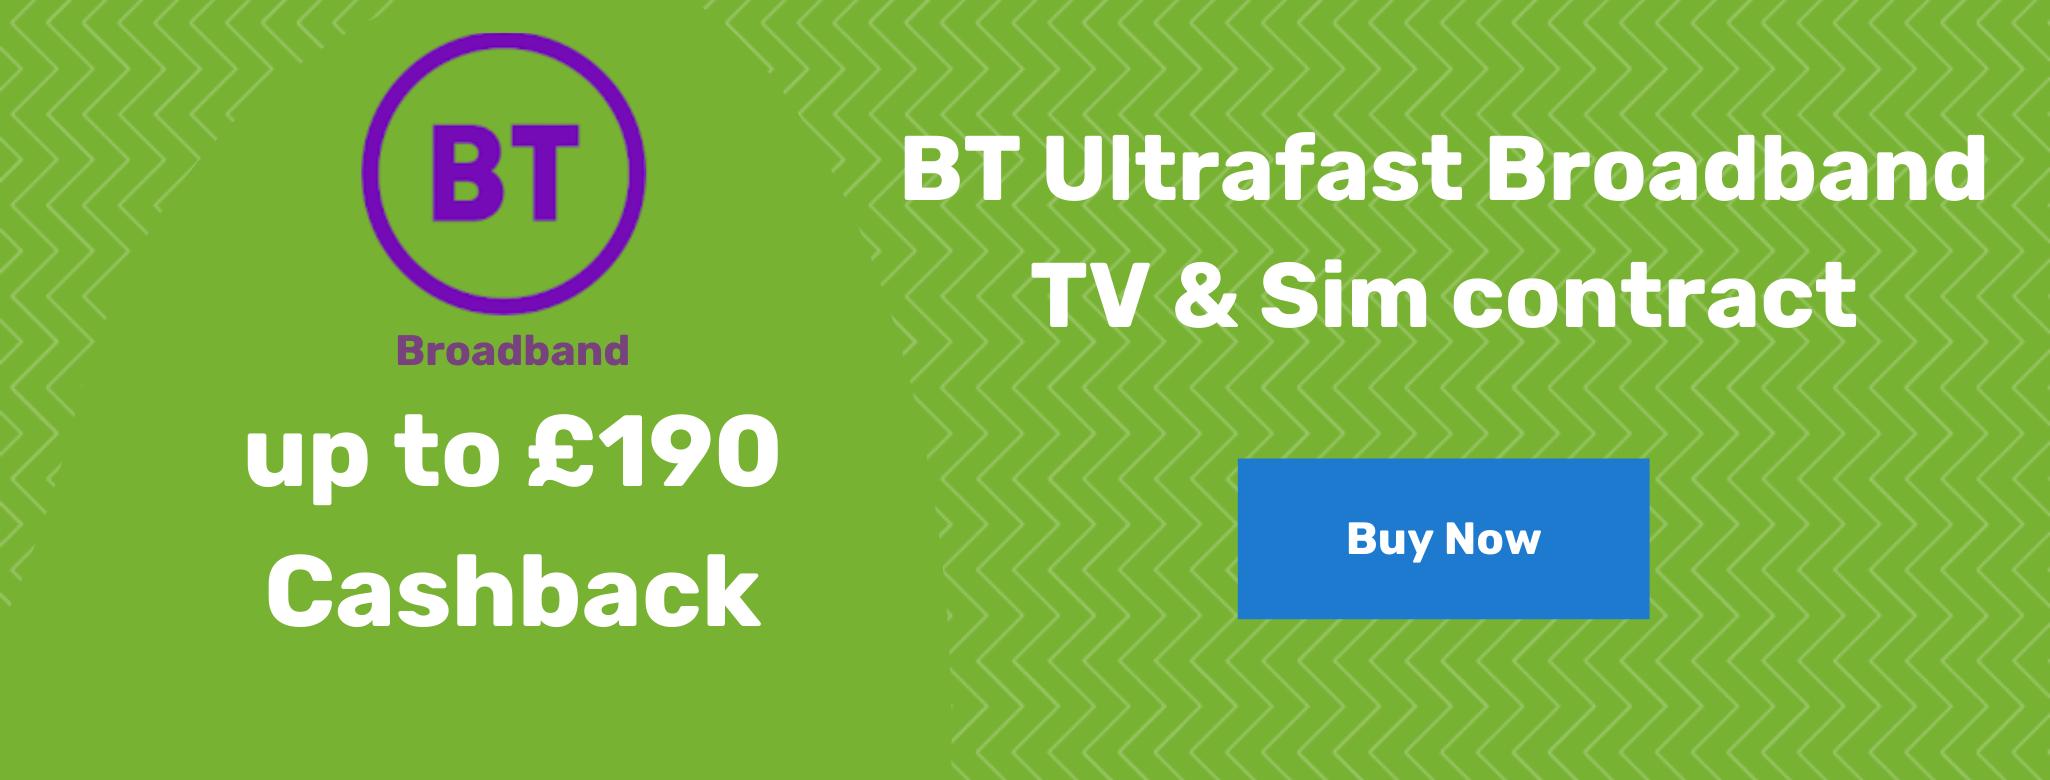 BT Broadband up to £190 cashback